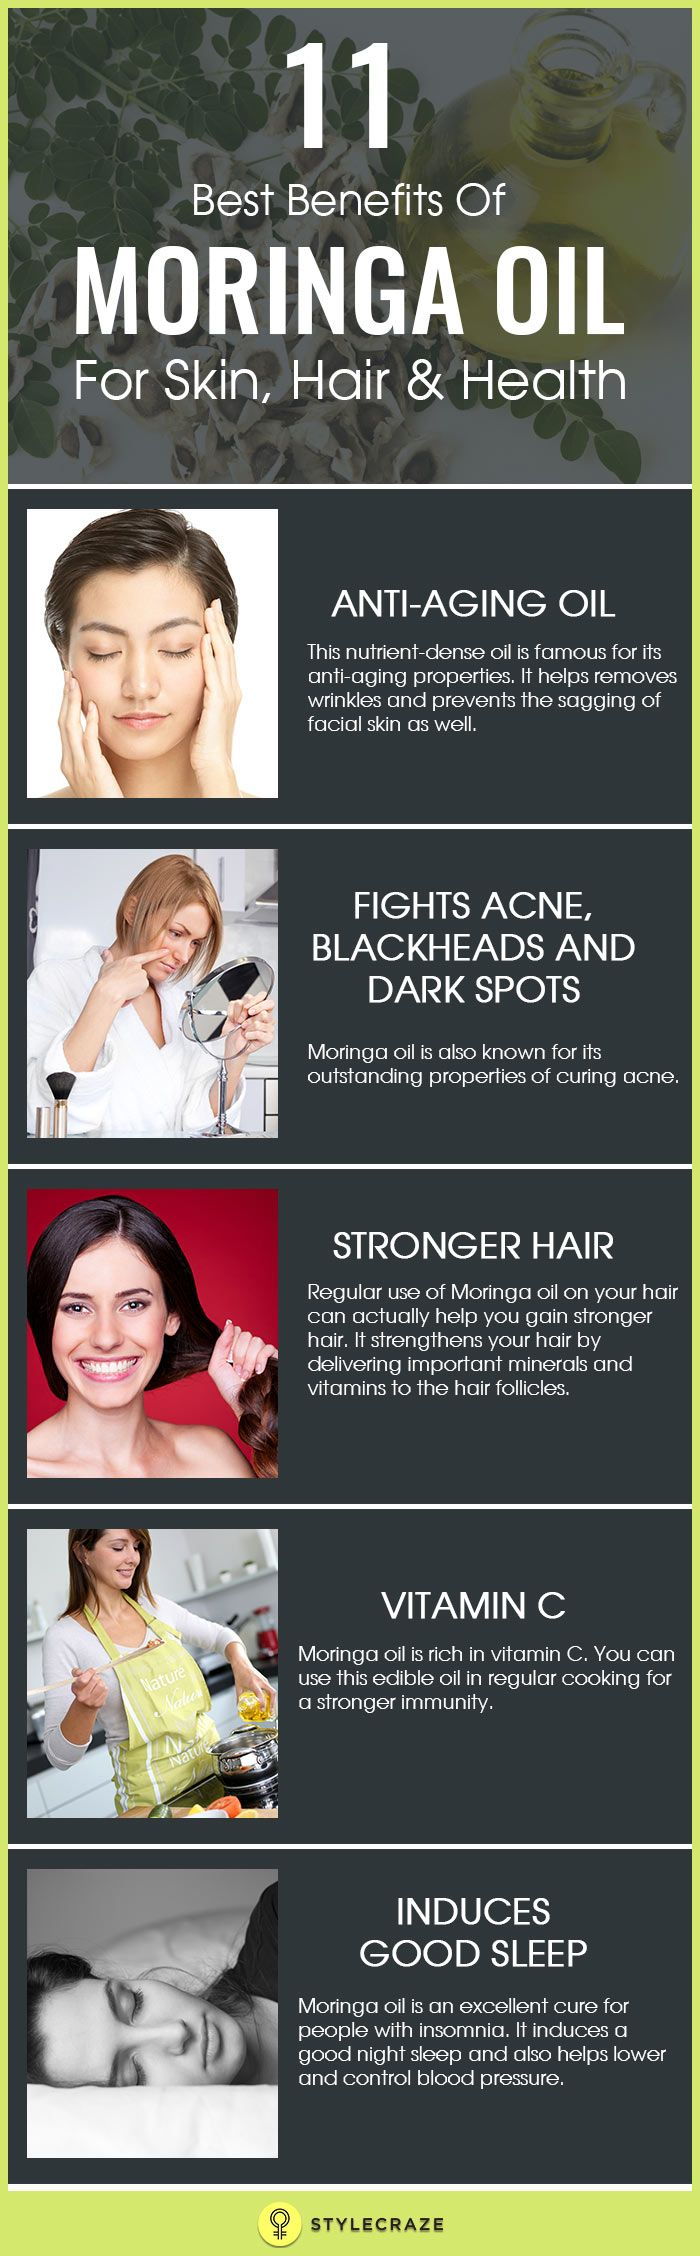 Moringa Oil Skin Benefits recommendations